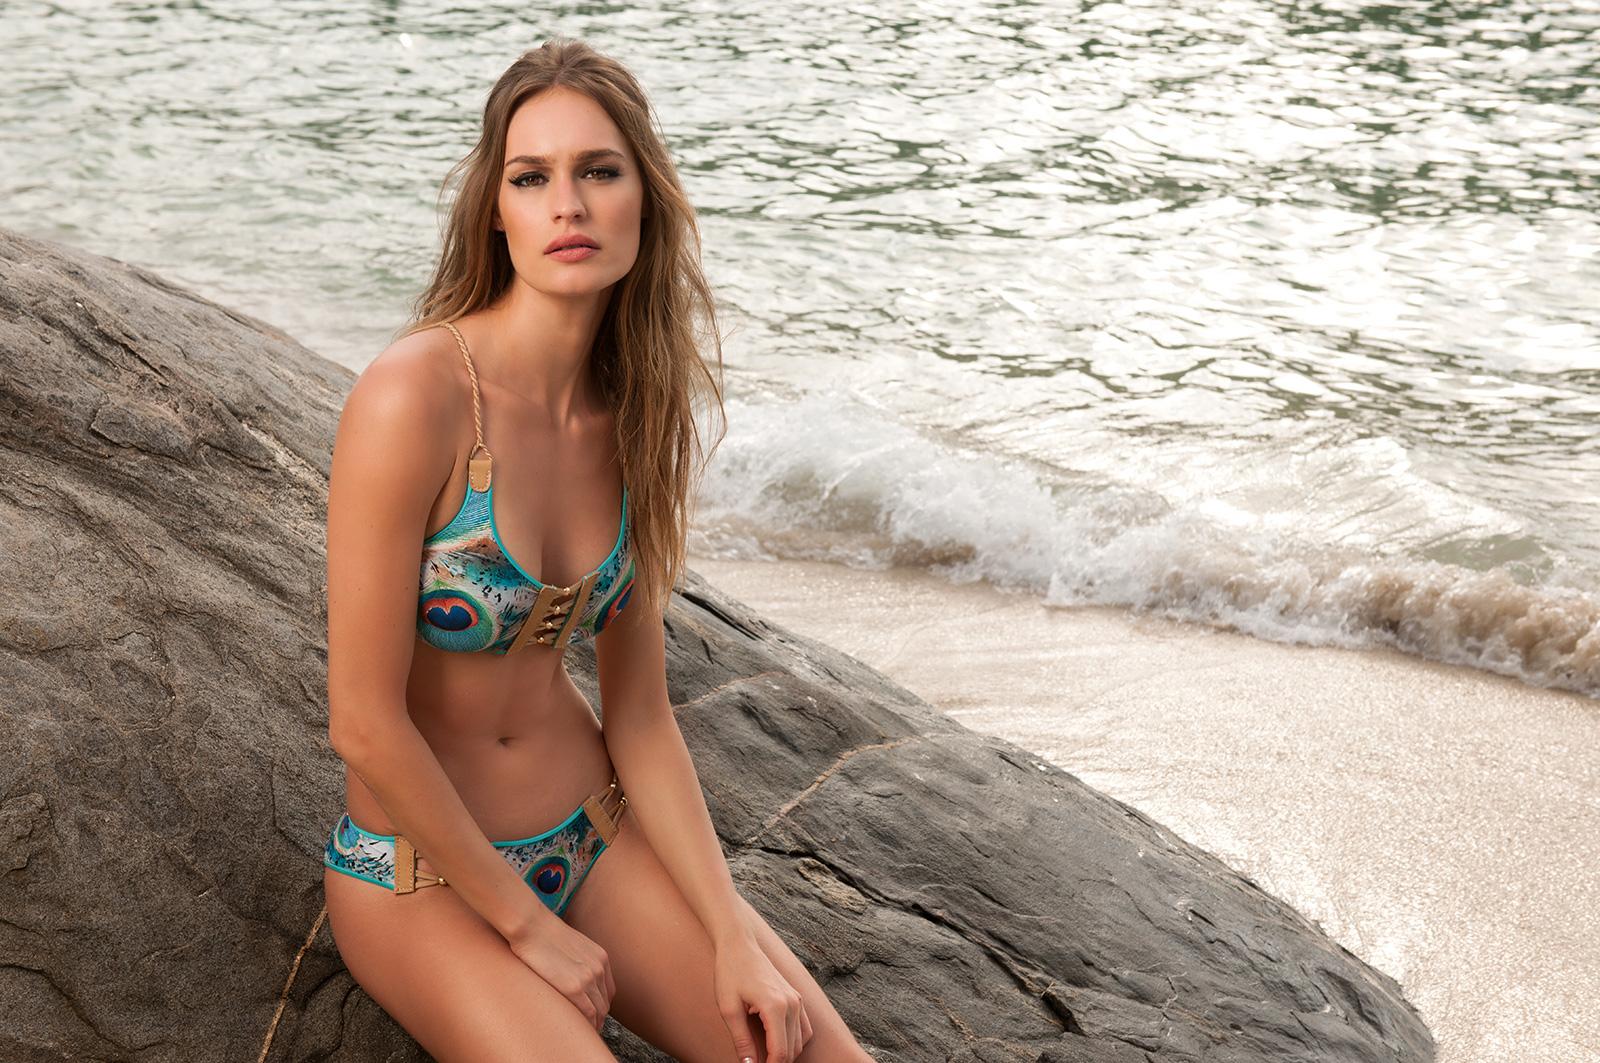 Sports bra style bikini